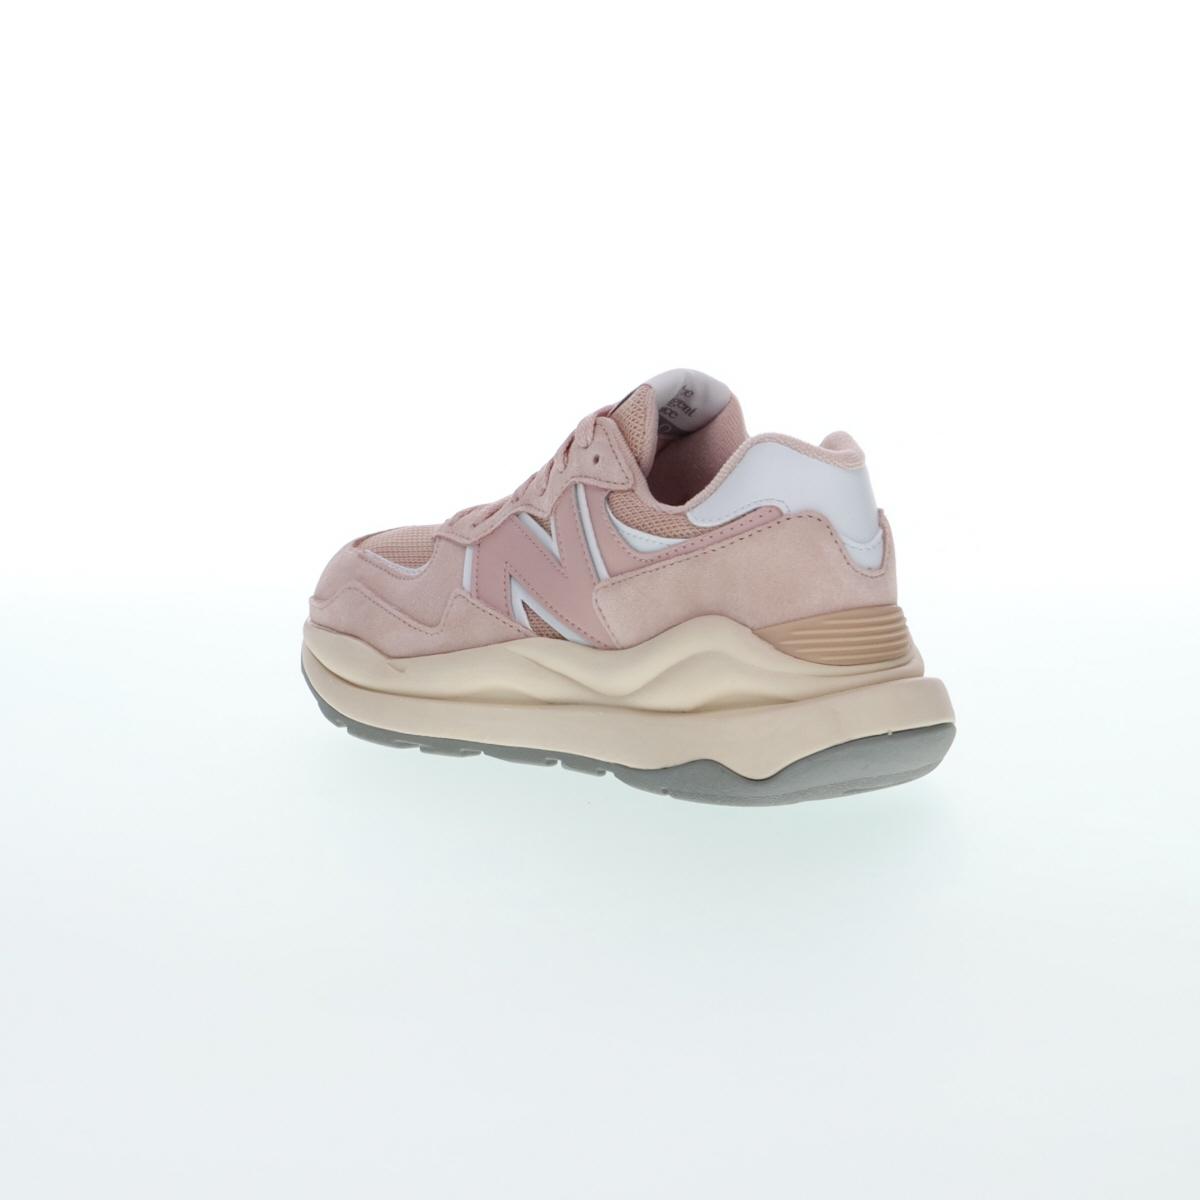 adidas samba classic malaysia shoes sale